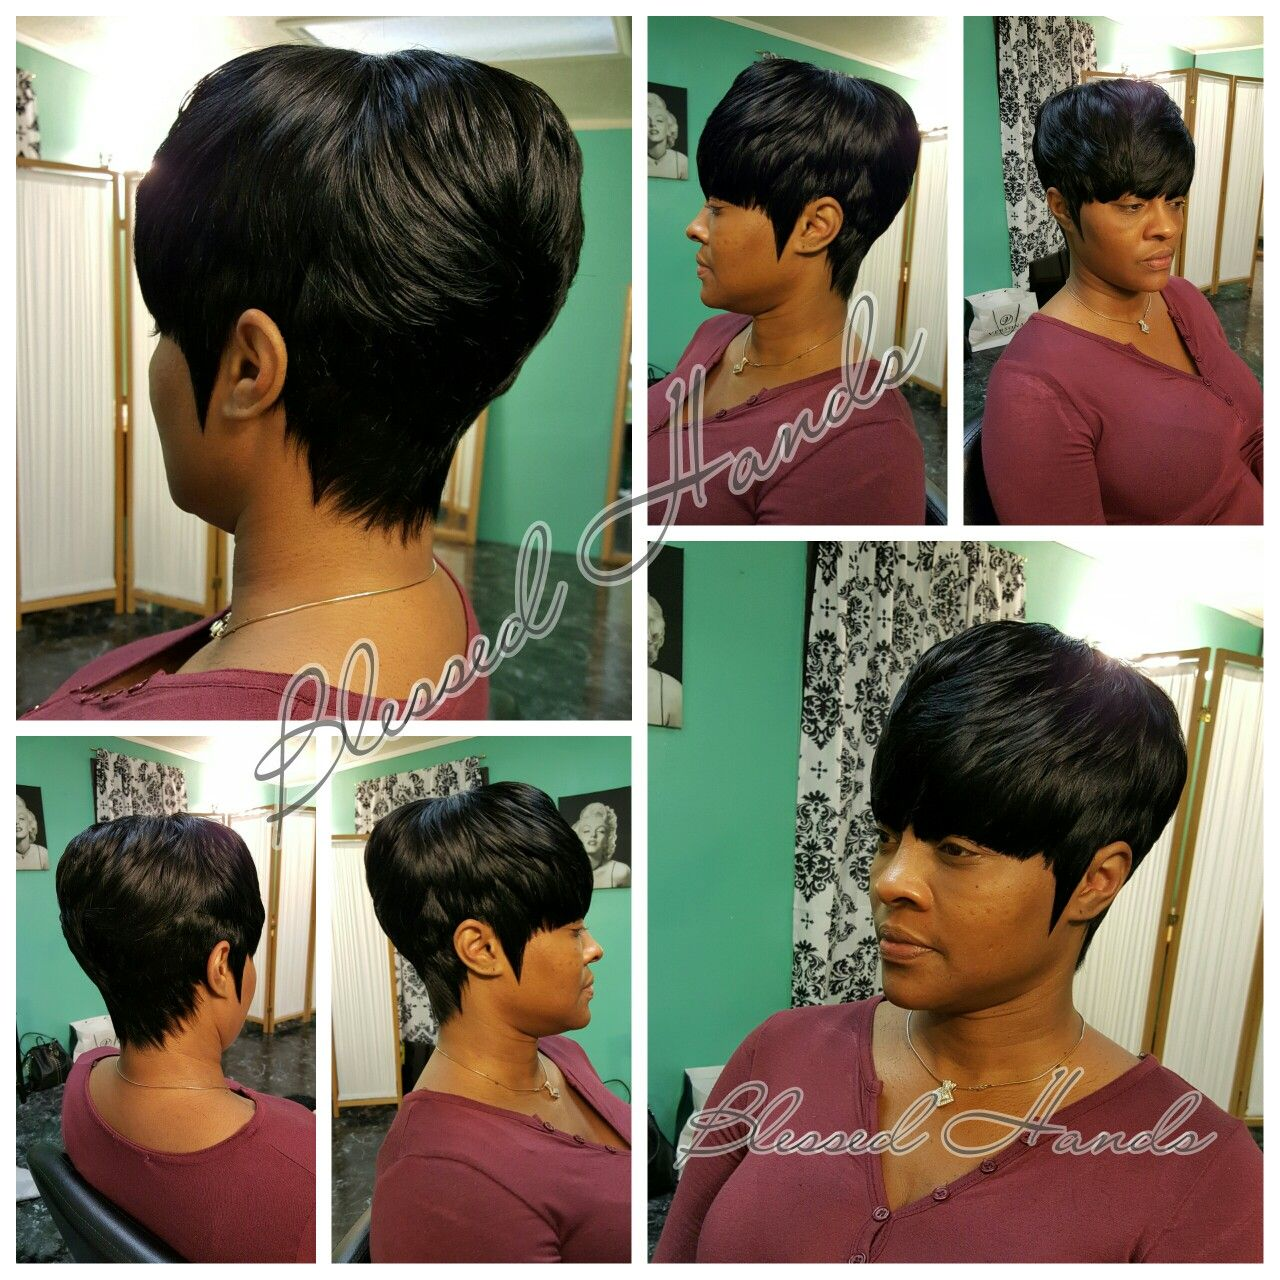 Short Tara 28pc Quick Weave Blessed Hands Quick Weave Hairstyles Quick Weave Black Hairstyles With Weave